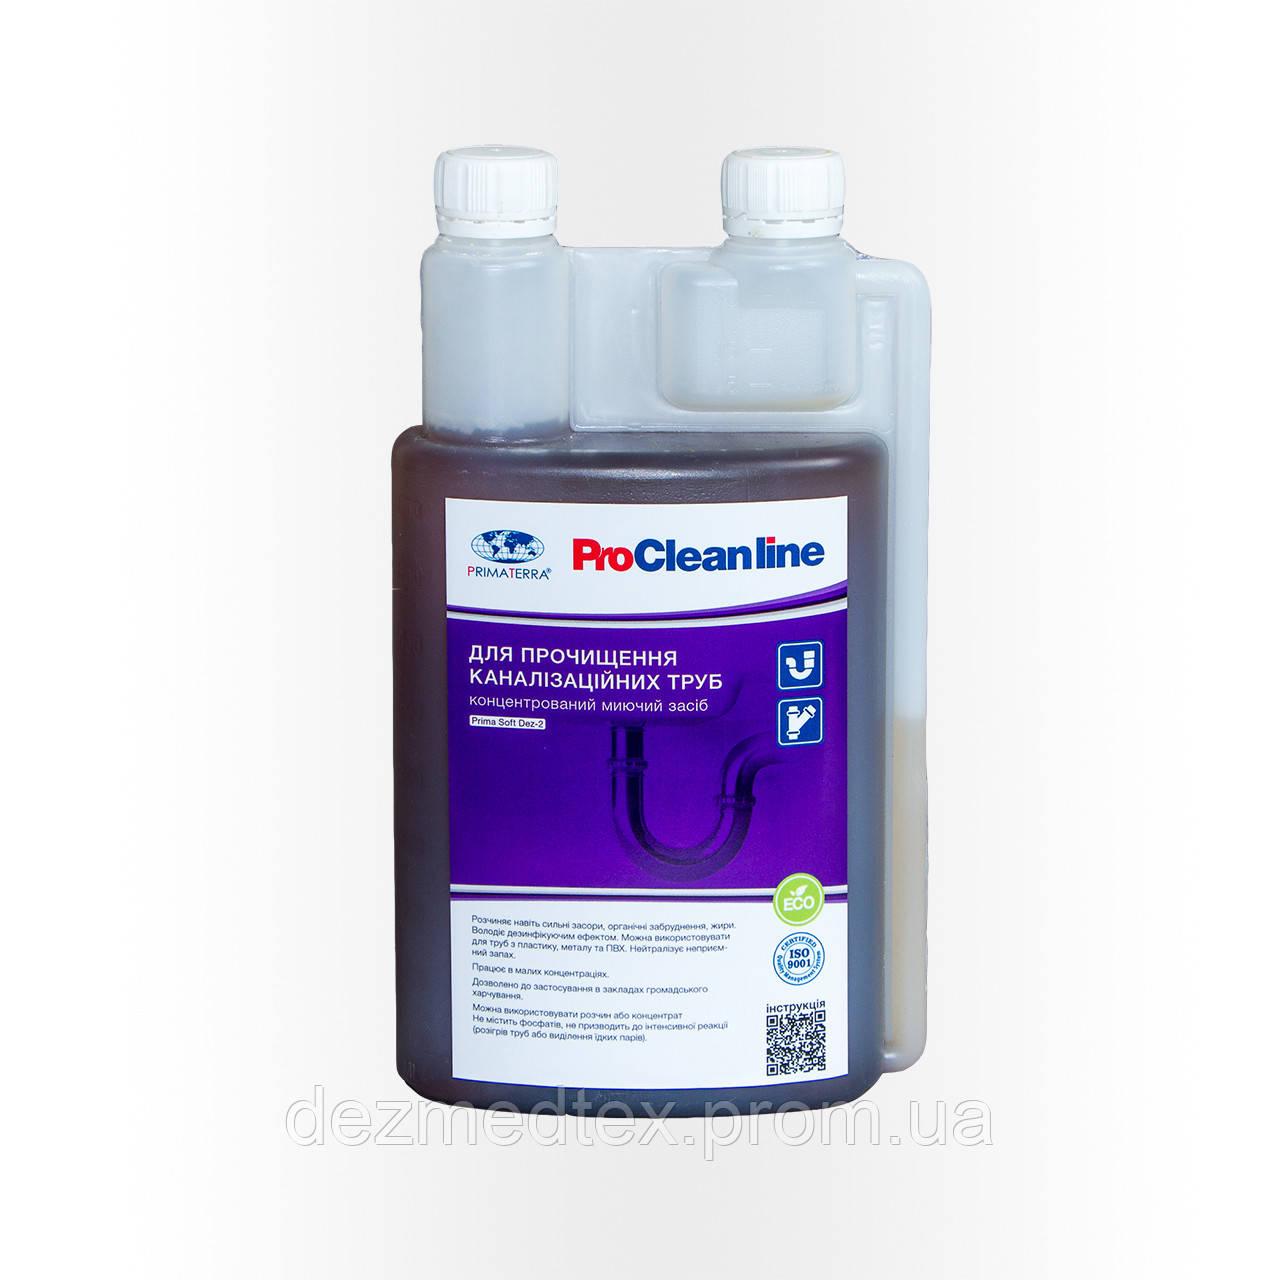 Для прочищення каналізації, концентрат (1/10), PRIMATERRA Soft Dez-2 (1.3 кг)